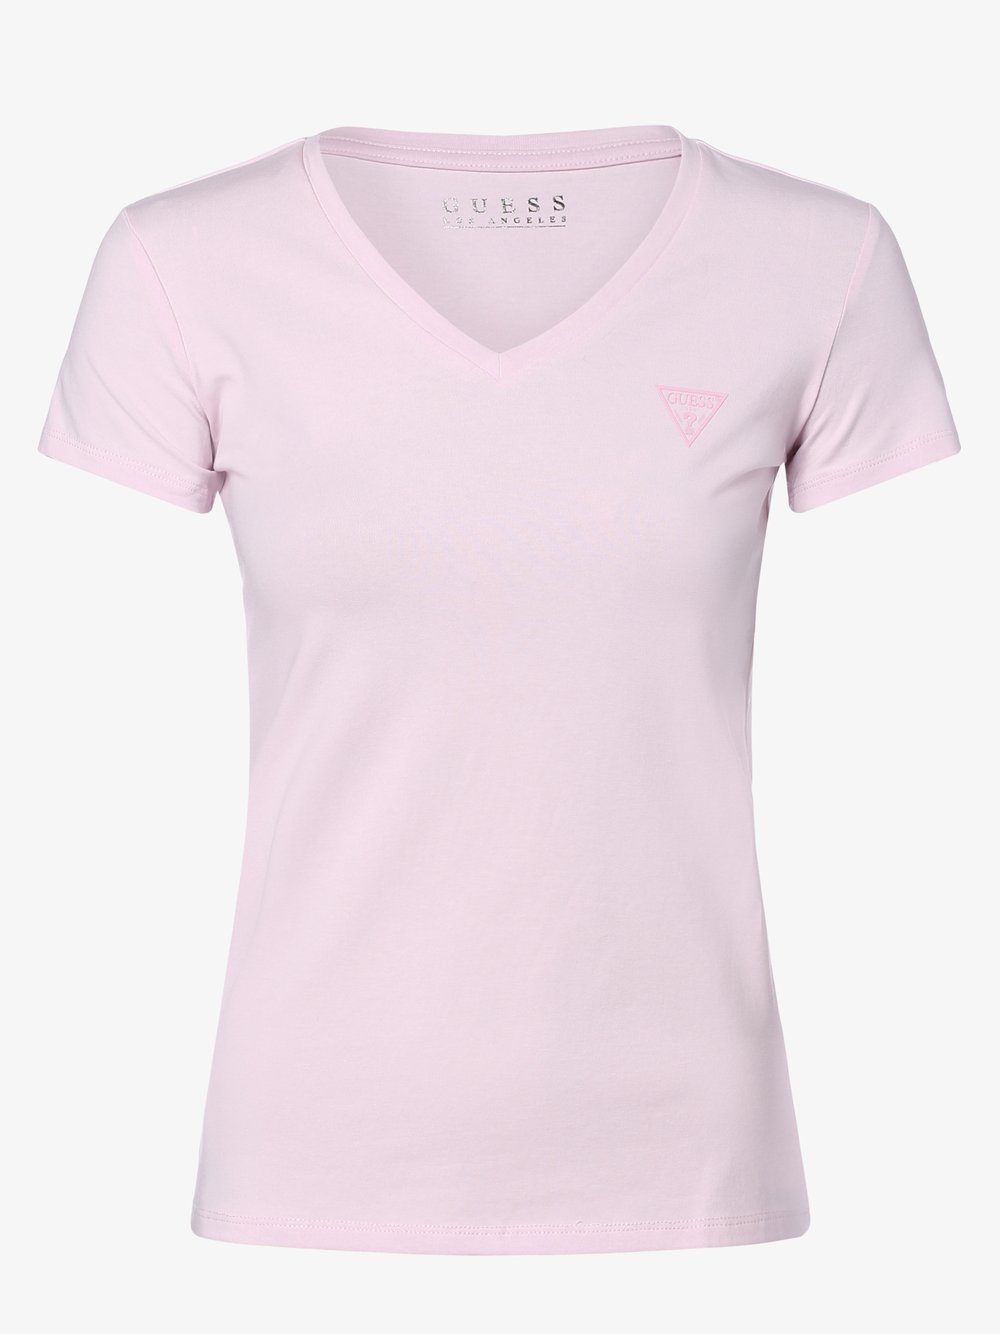 Guess Jeans - T-shirt damski, różowy